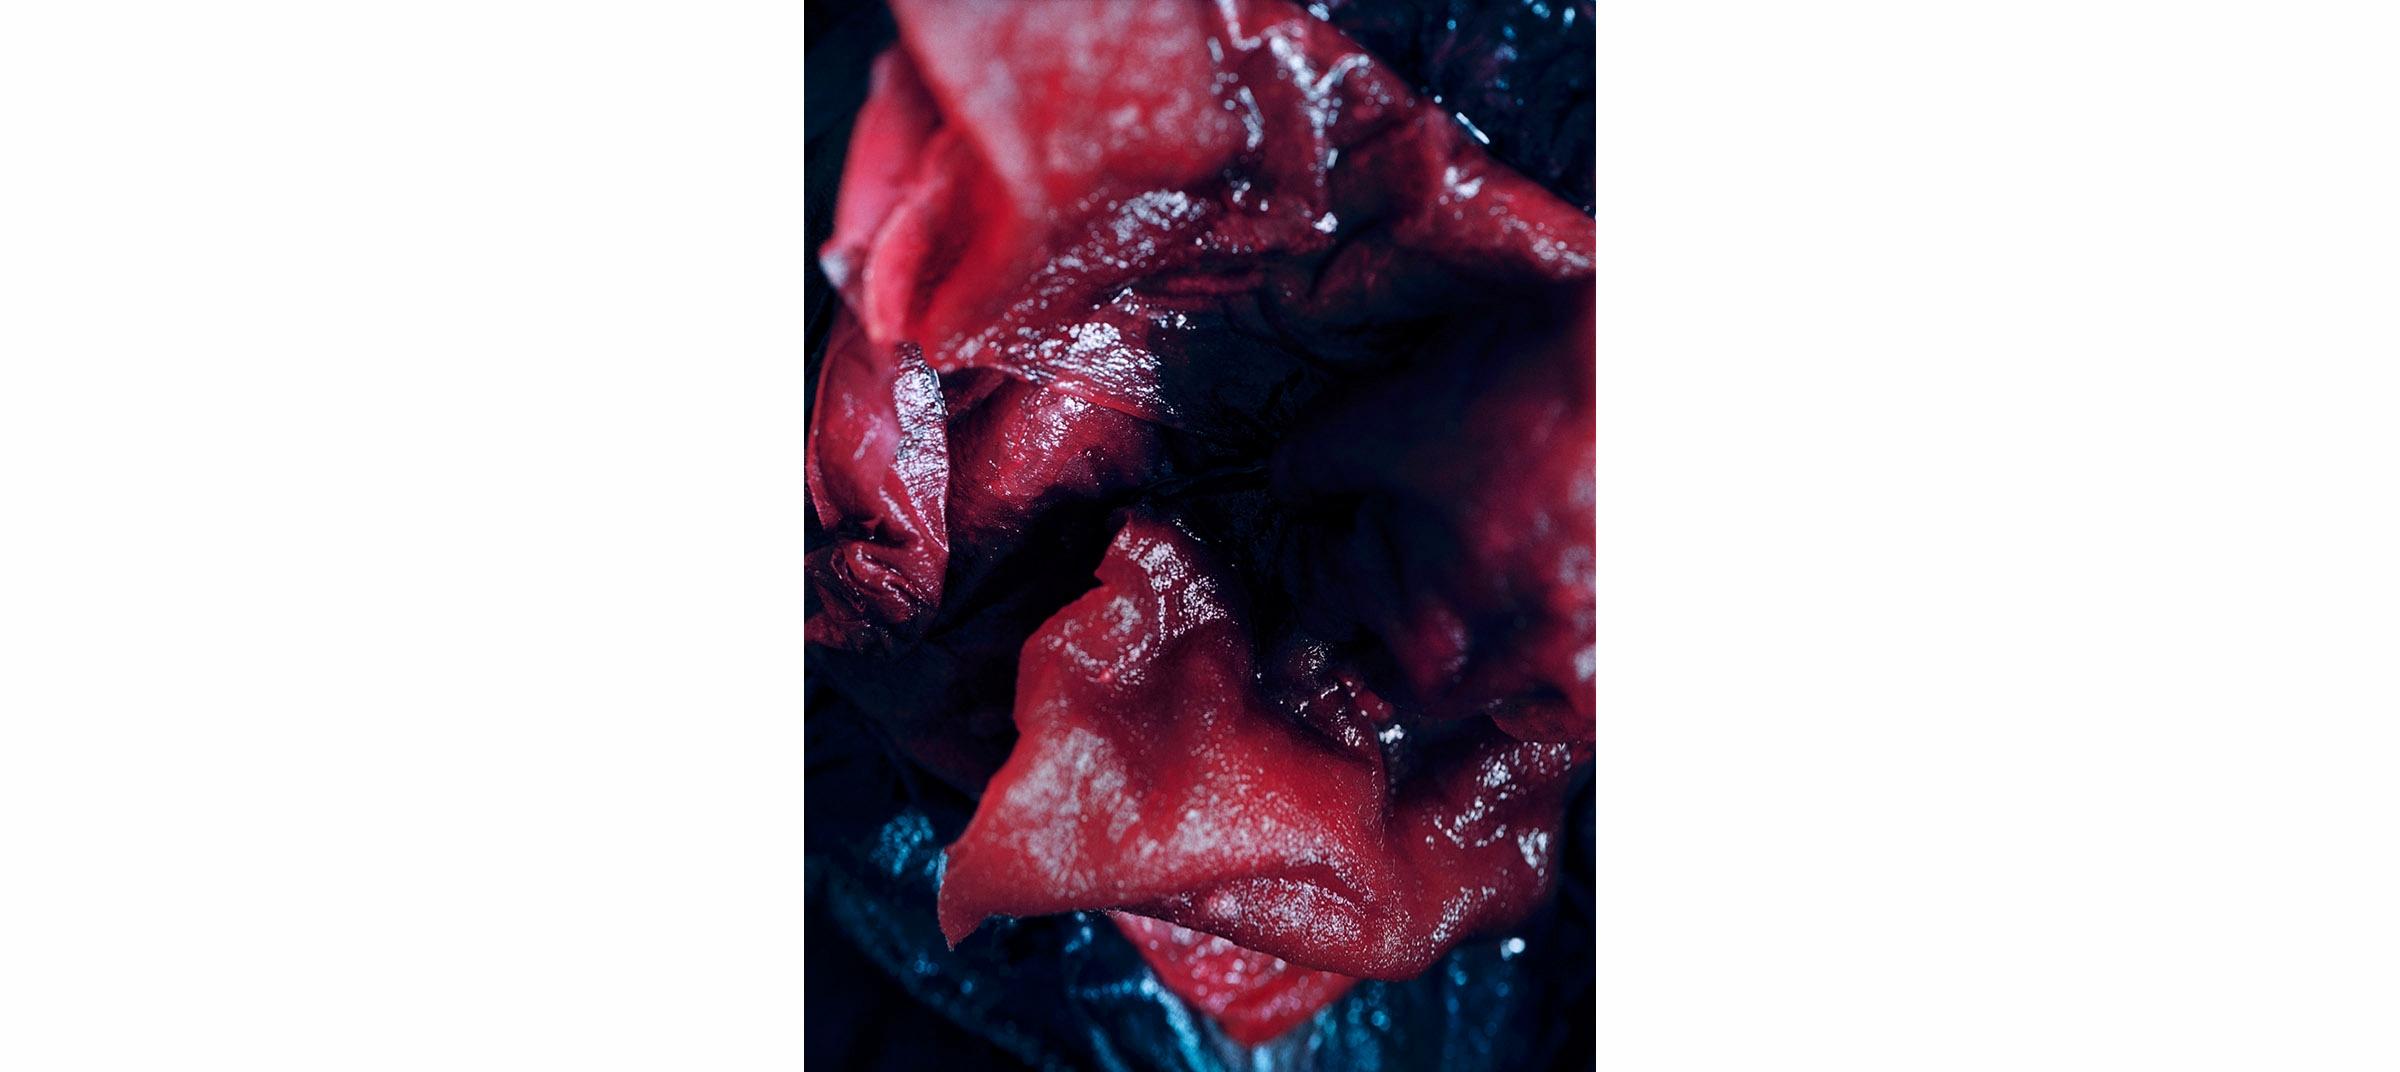 Red Fluids  Untitled N°8, 2005/2008 Tirage gélatino argentique 144 x 104 cm | Gelatin silver print 56,69 x 40,94 inches  1/5